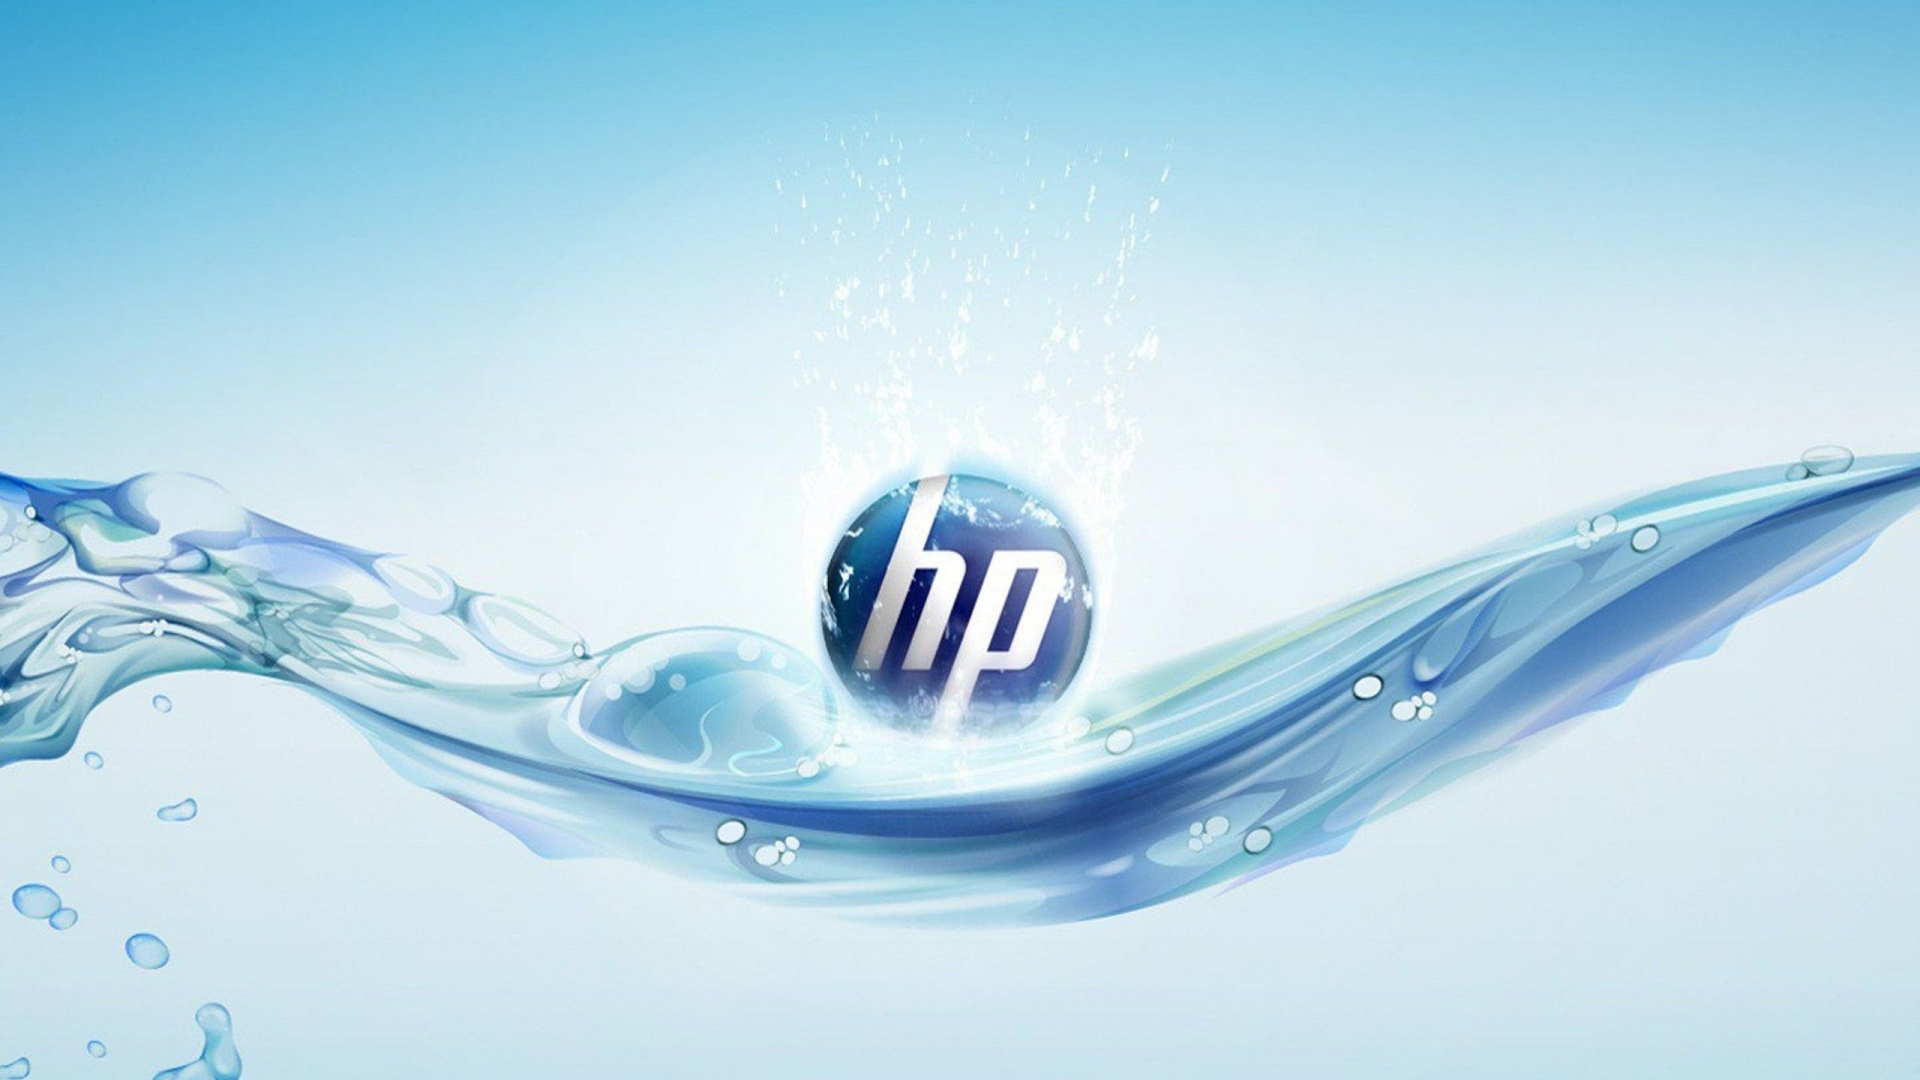 Herunterladen 1920x1080 Full Hd Hintergrundbilder Hp Logo